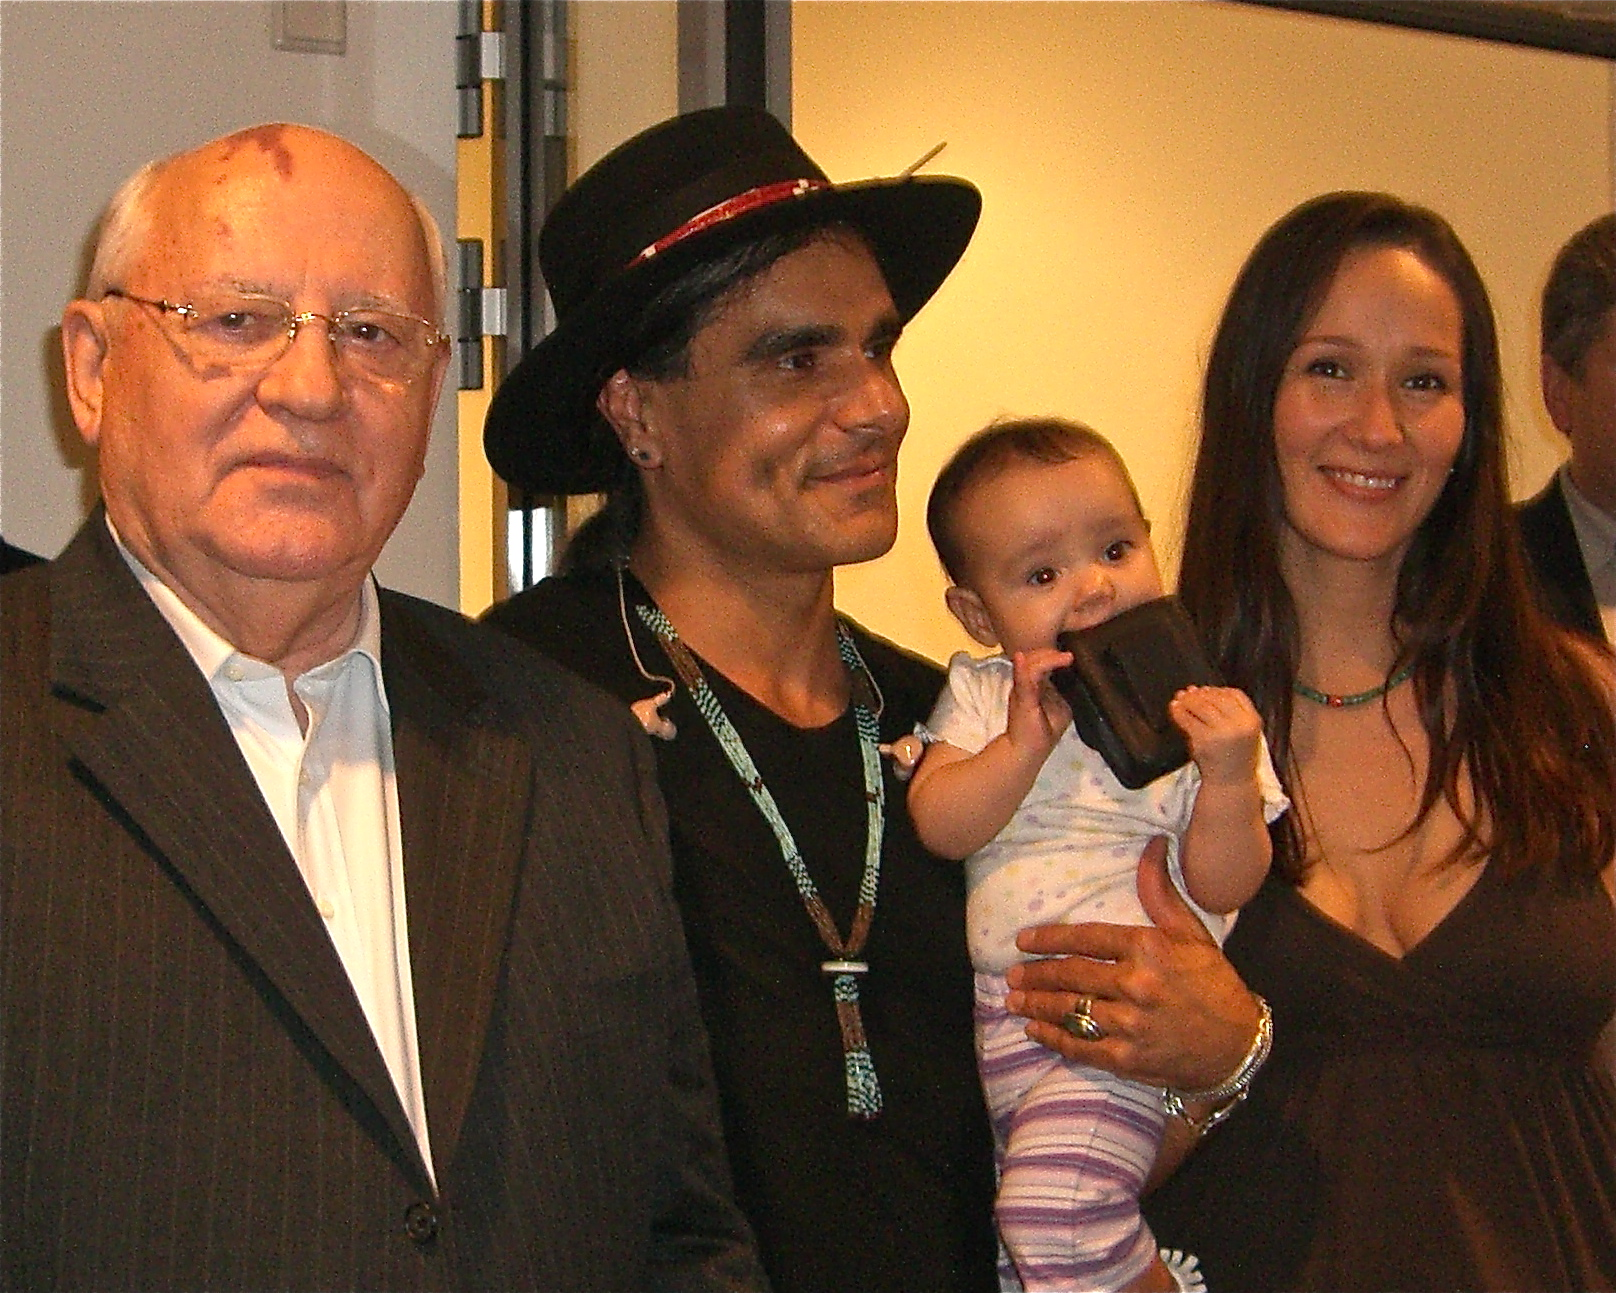 Mikhail, Robby, Cheyenne & Stacey.JPG